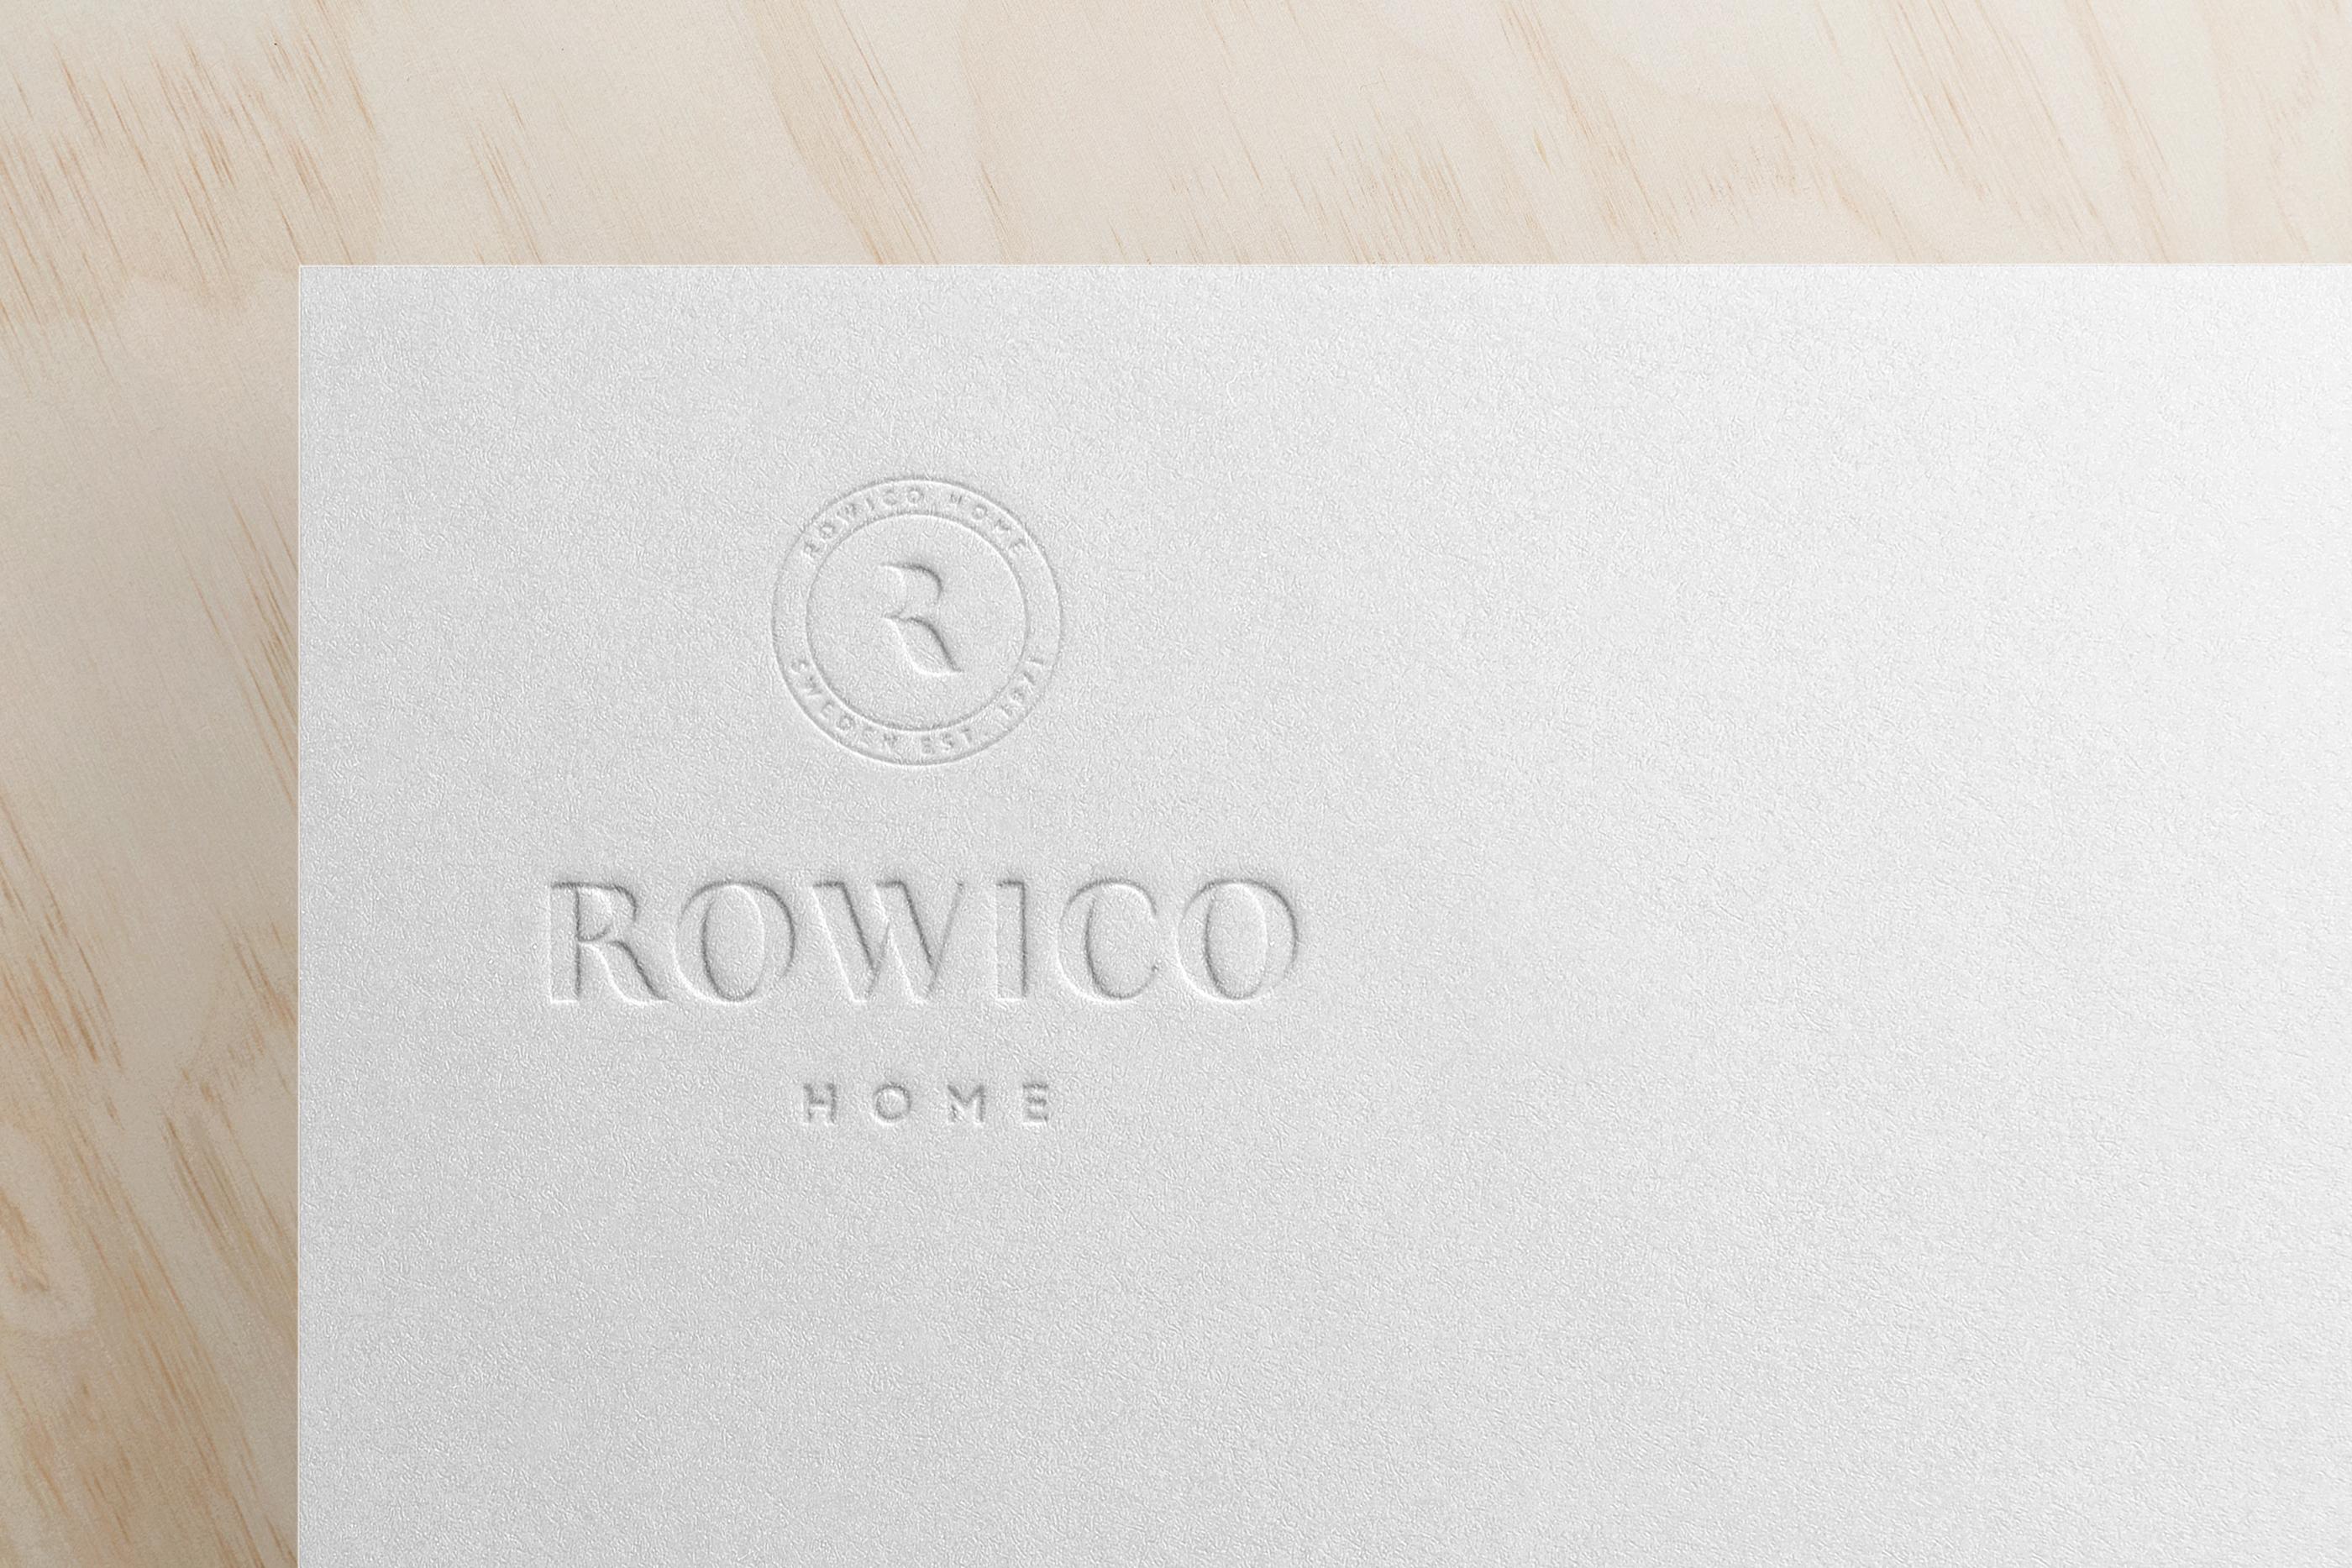 Rowico Home